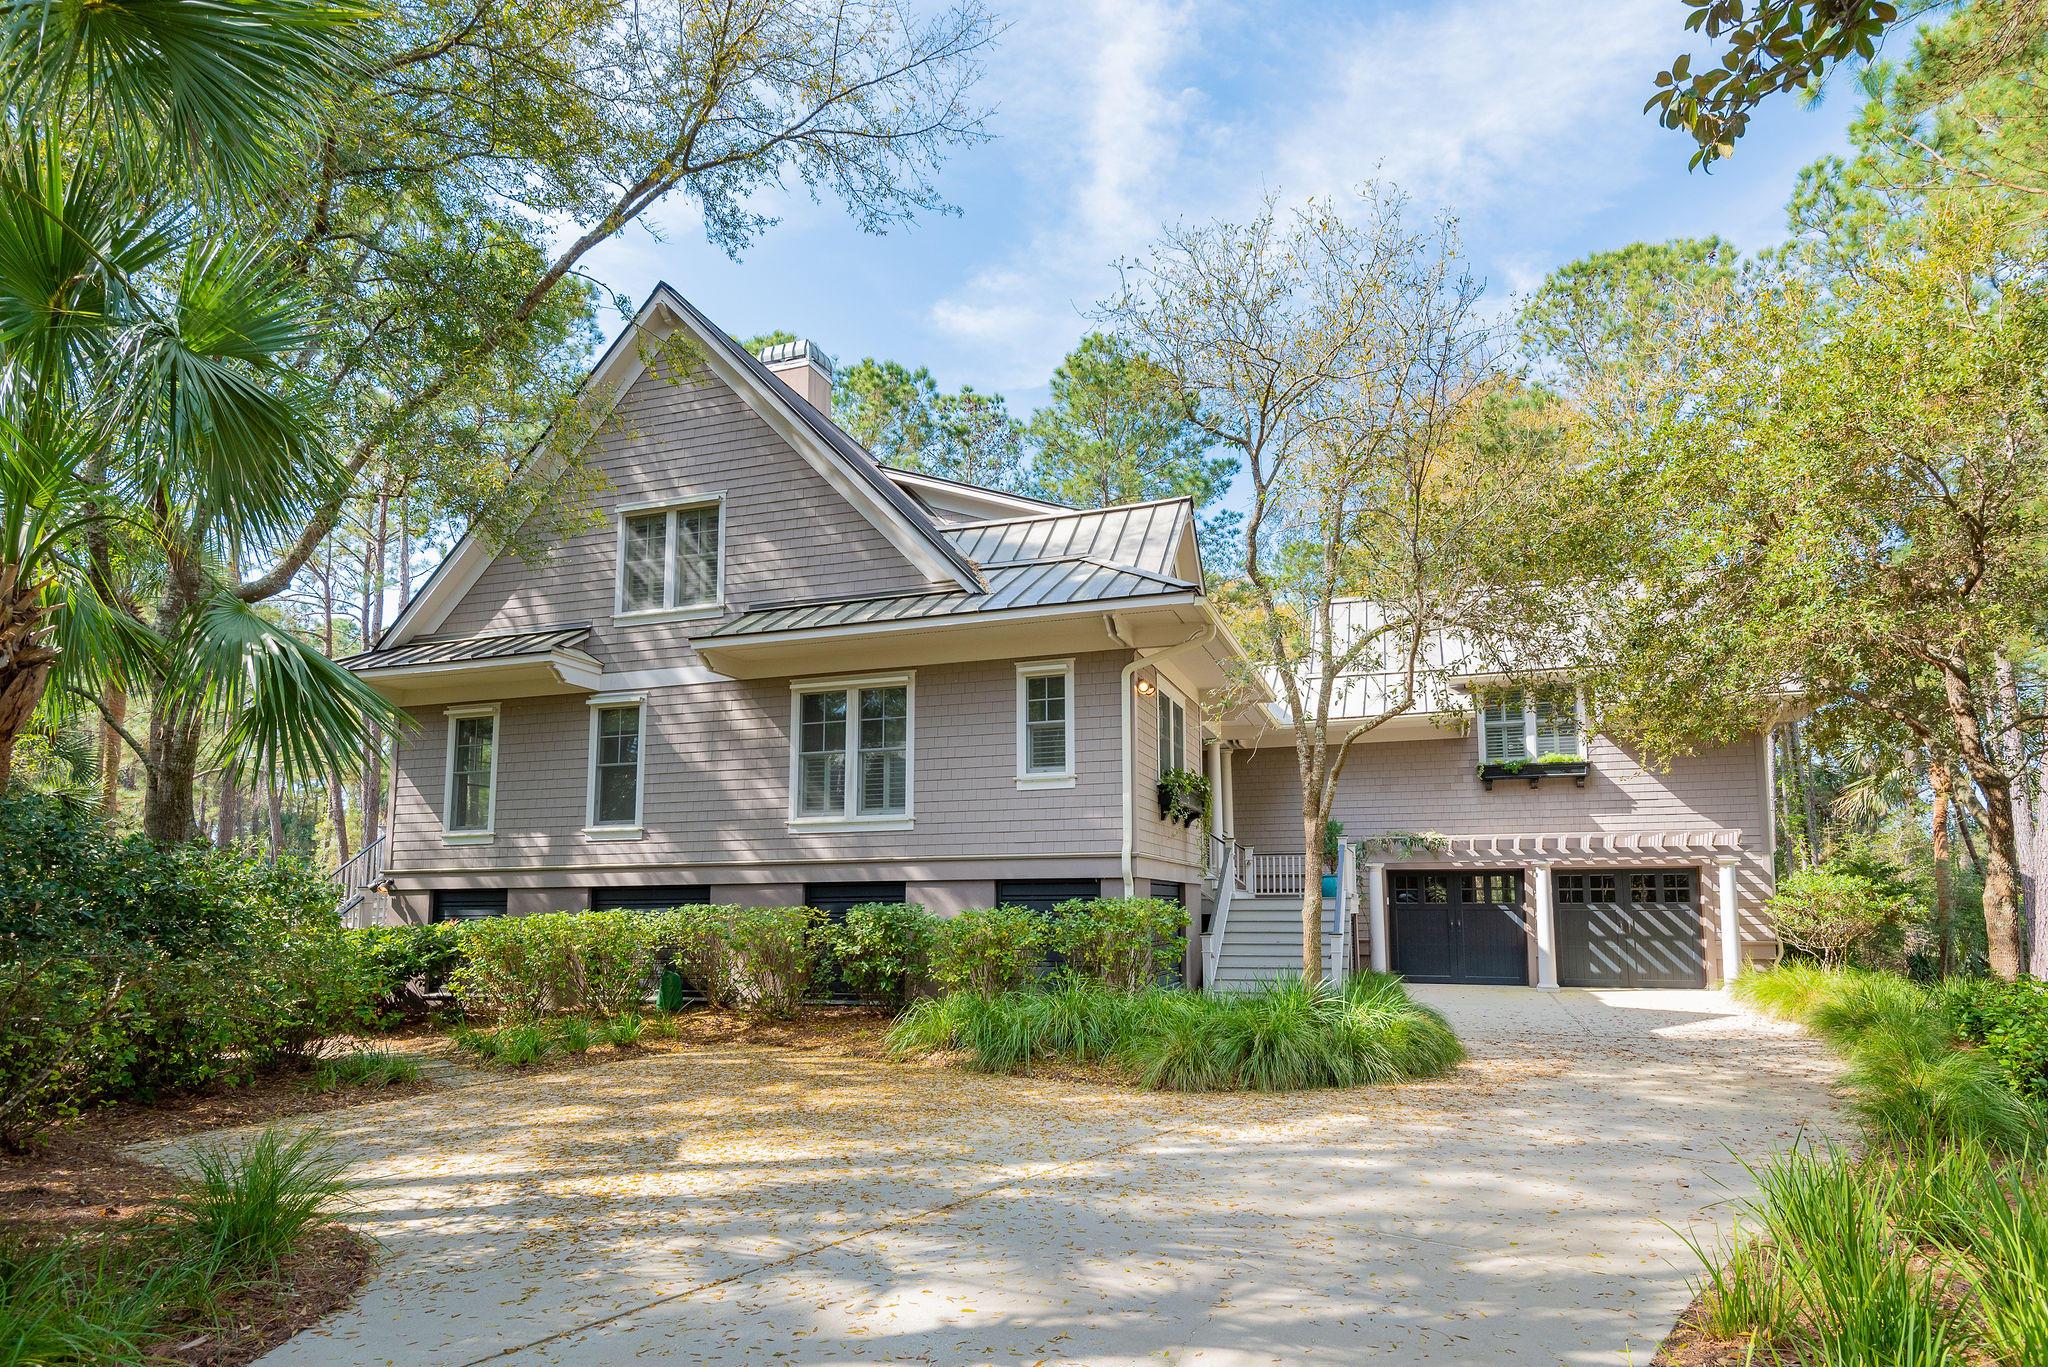 Kiawah Island Homes For Sale - 3 Grey Widgeon, Kiawah Island, SC - 59